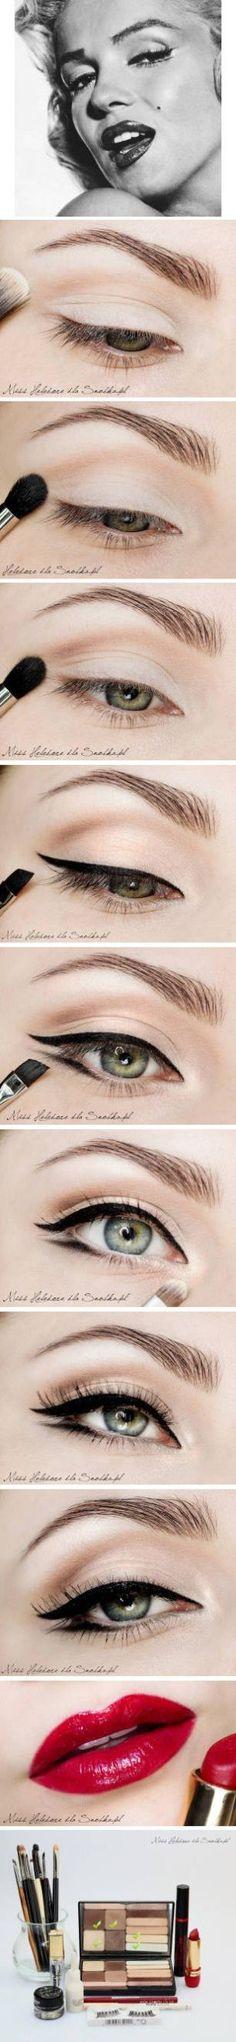 Marilyn's gorgeous eye